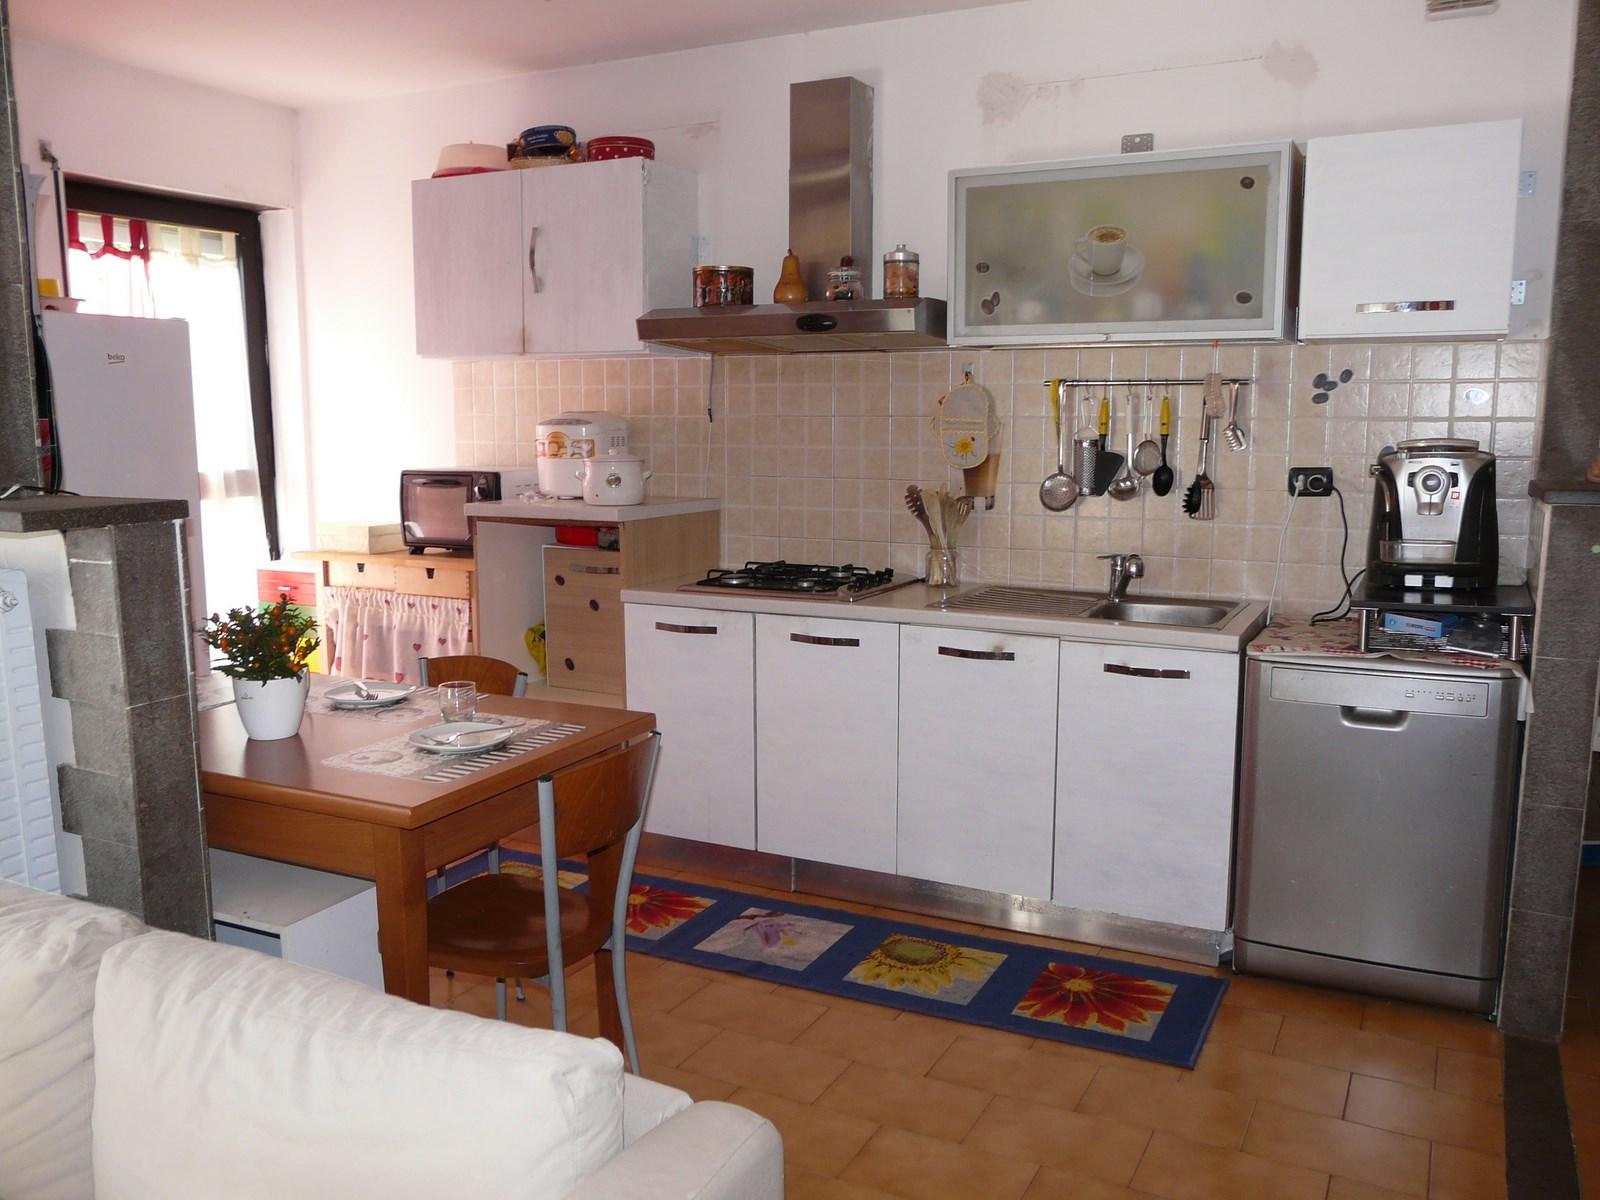 Appartamento vendita PERGINE VALSUGANA (TN) - 99 LOCALI - 150 MQ